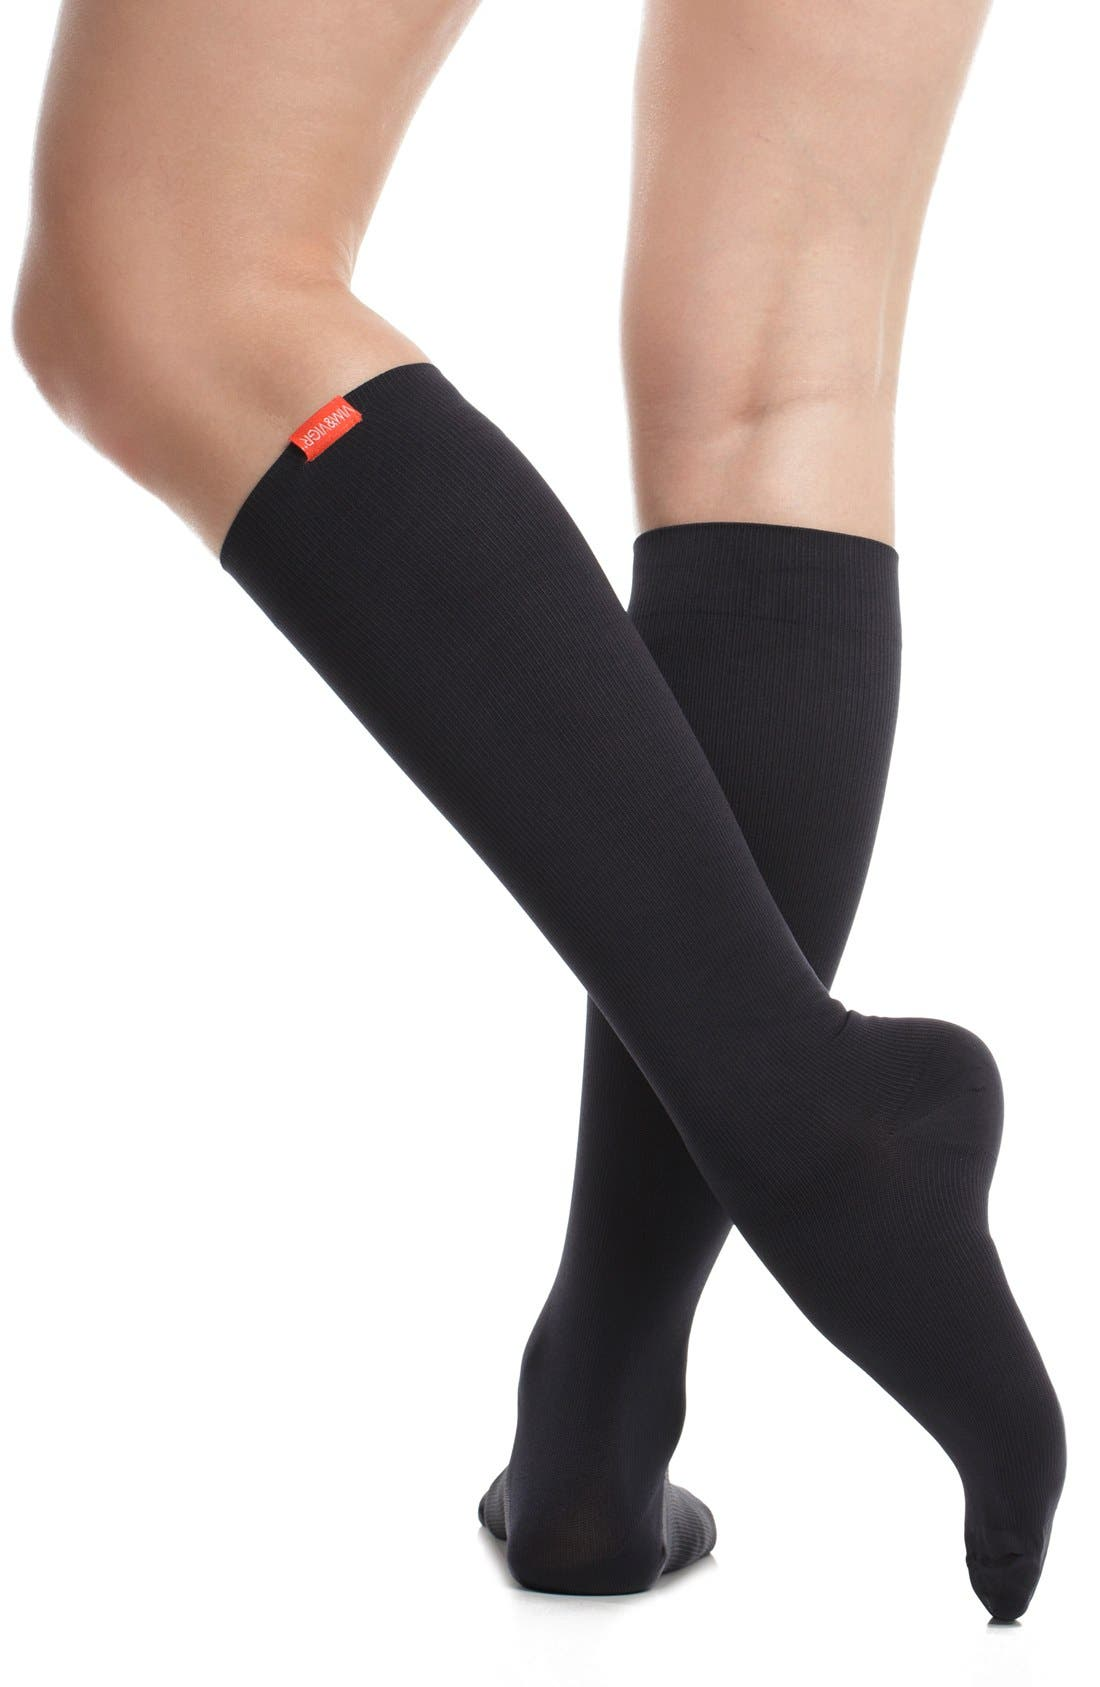 Solid Graduated Compression Trouser Socks,                             Alternate thumbnail 2, color,                             BLACK